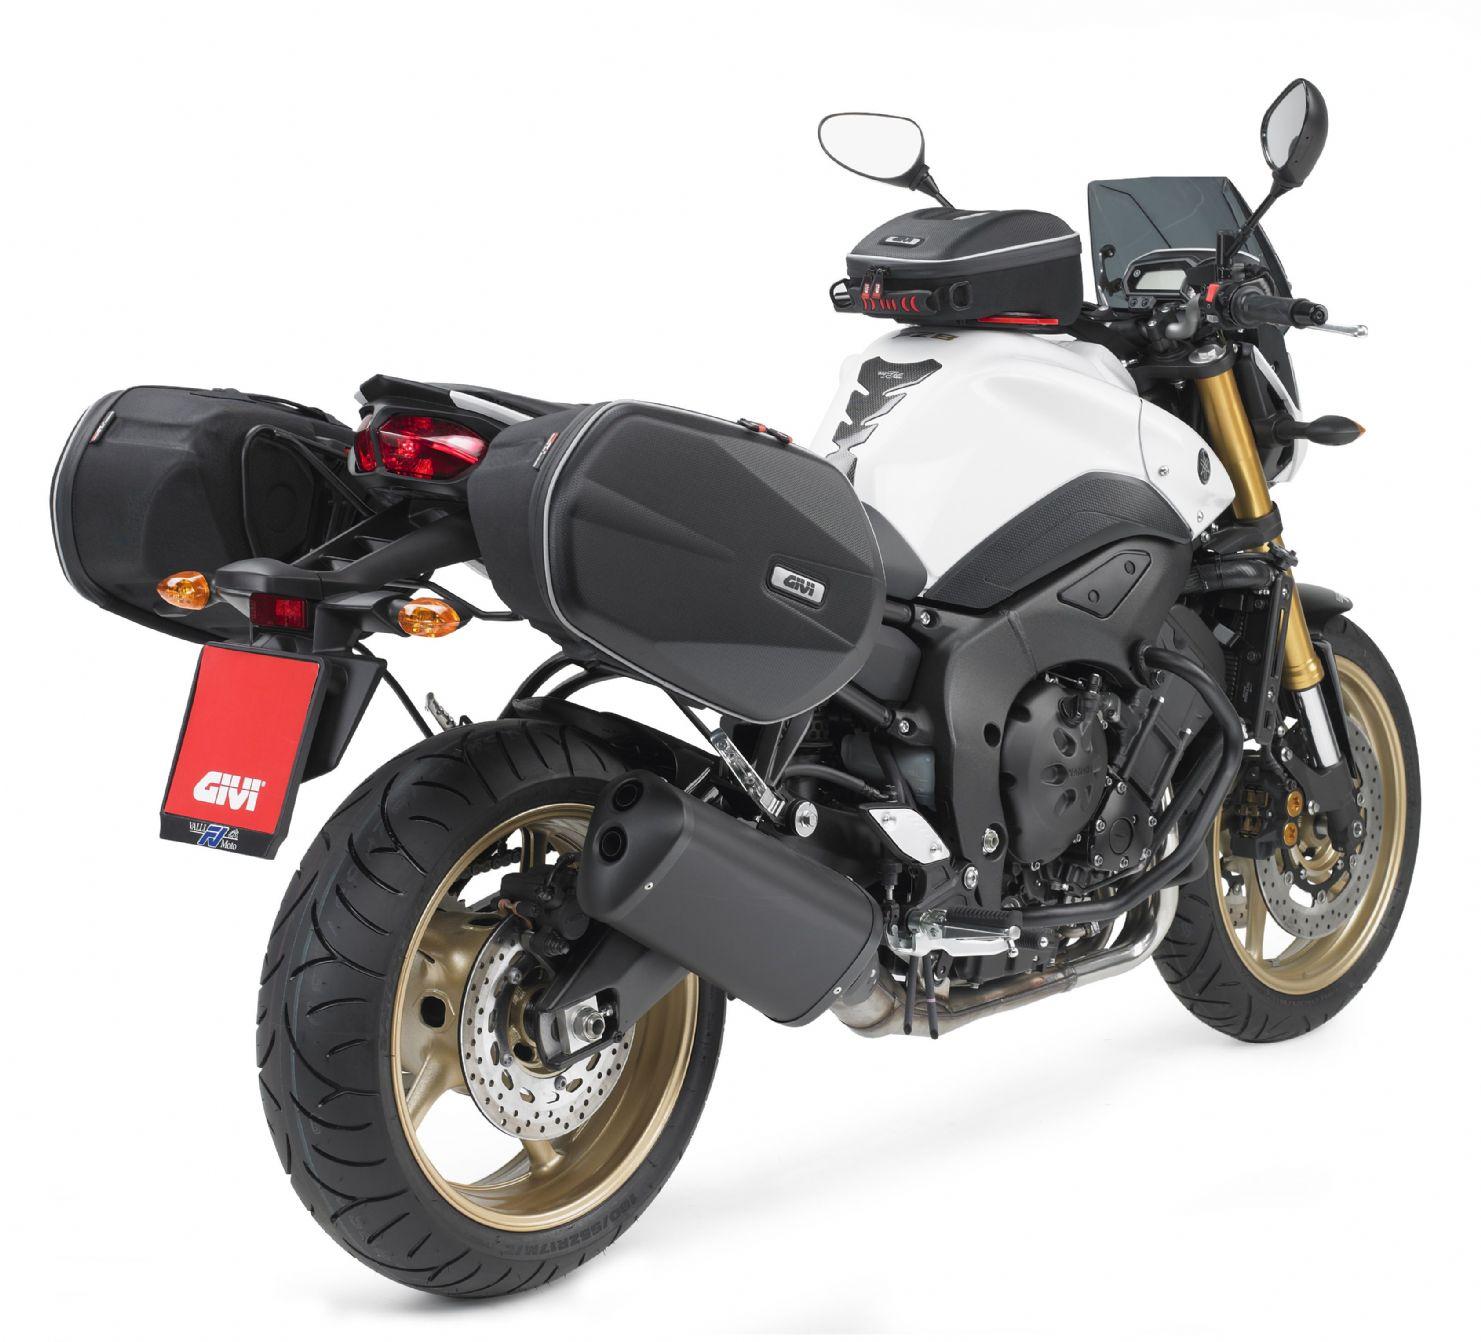 givi set side bags set 3d600 suzuki gsr 750 11 14 fitting kit easylock